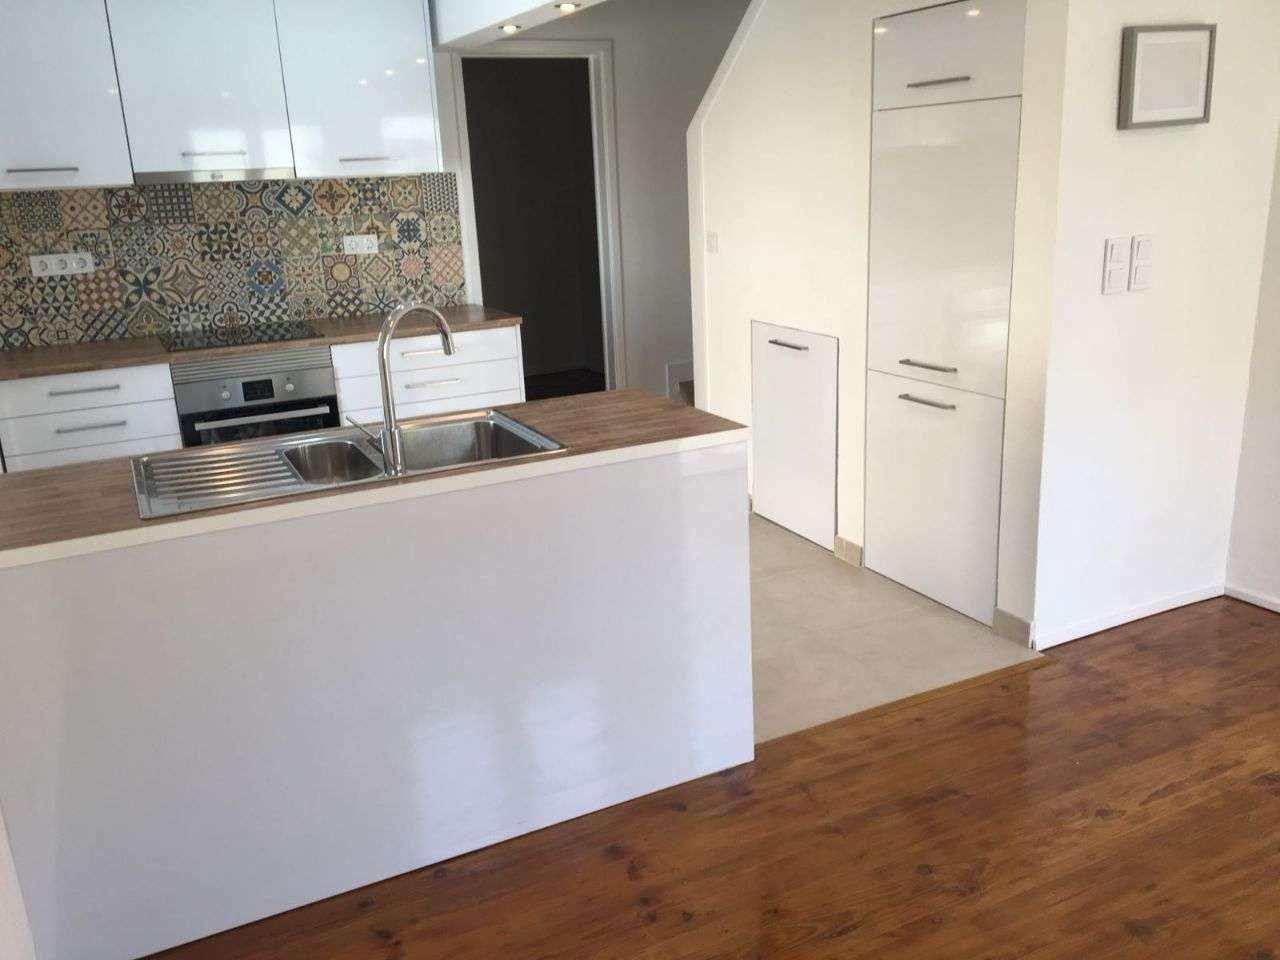 Moradia para arrendar, Olivais, Lisboa - Foto 7